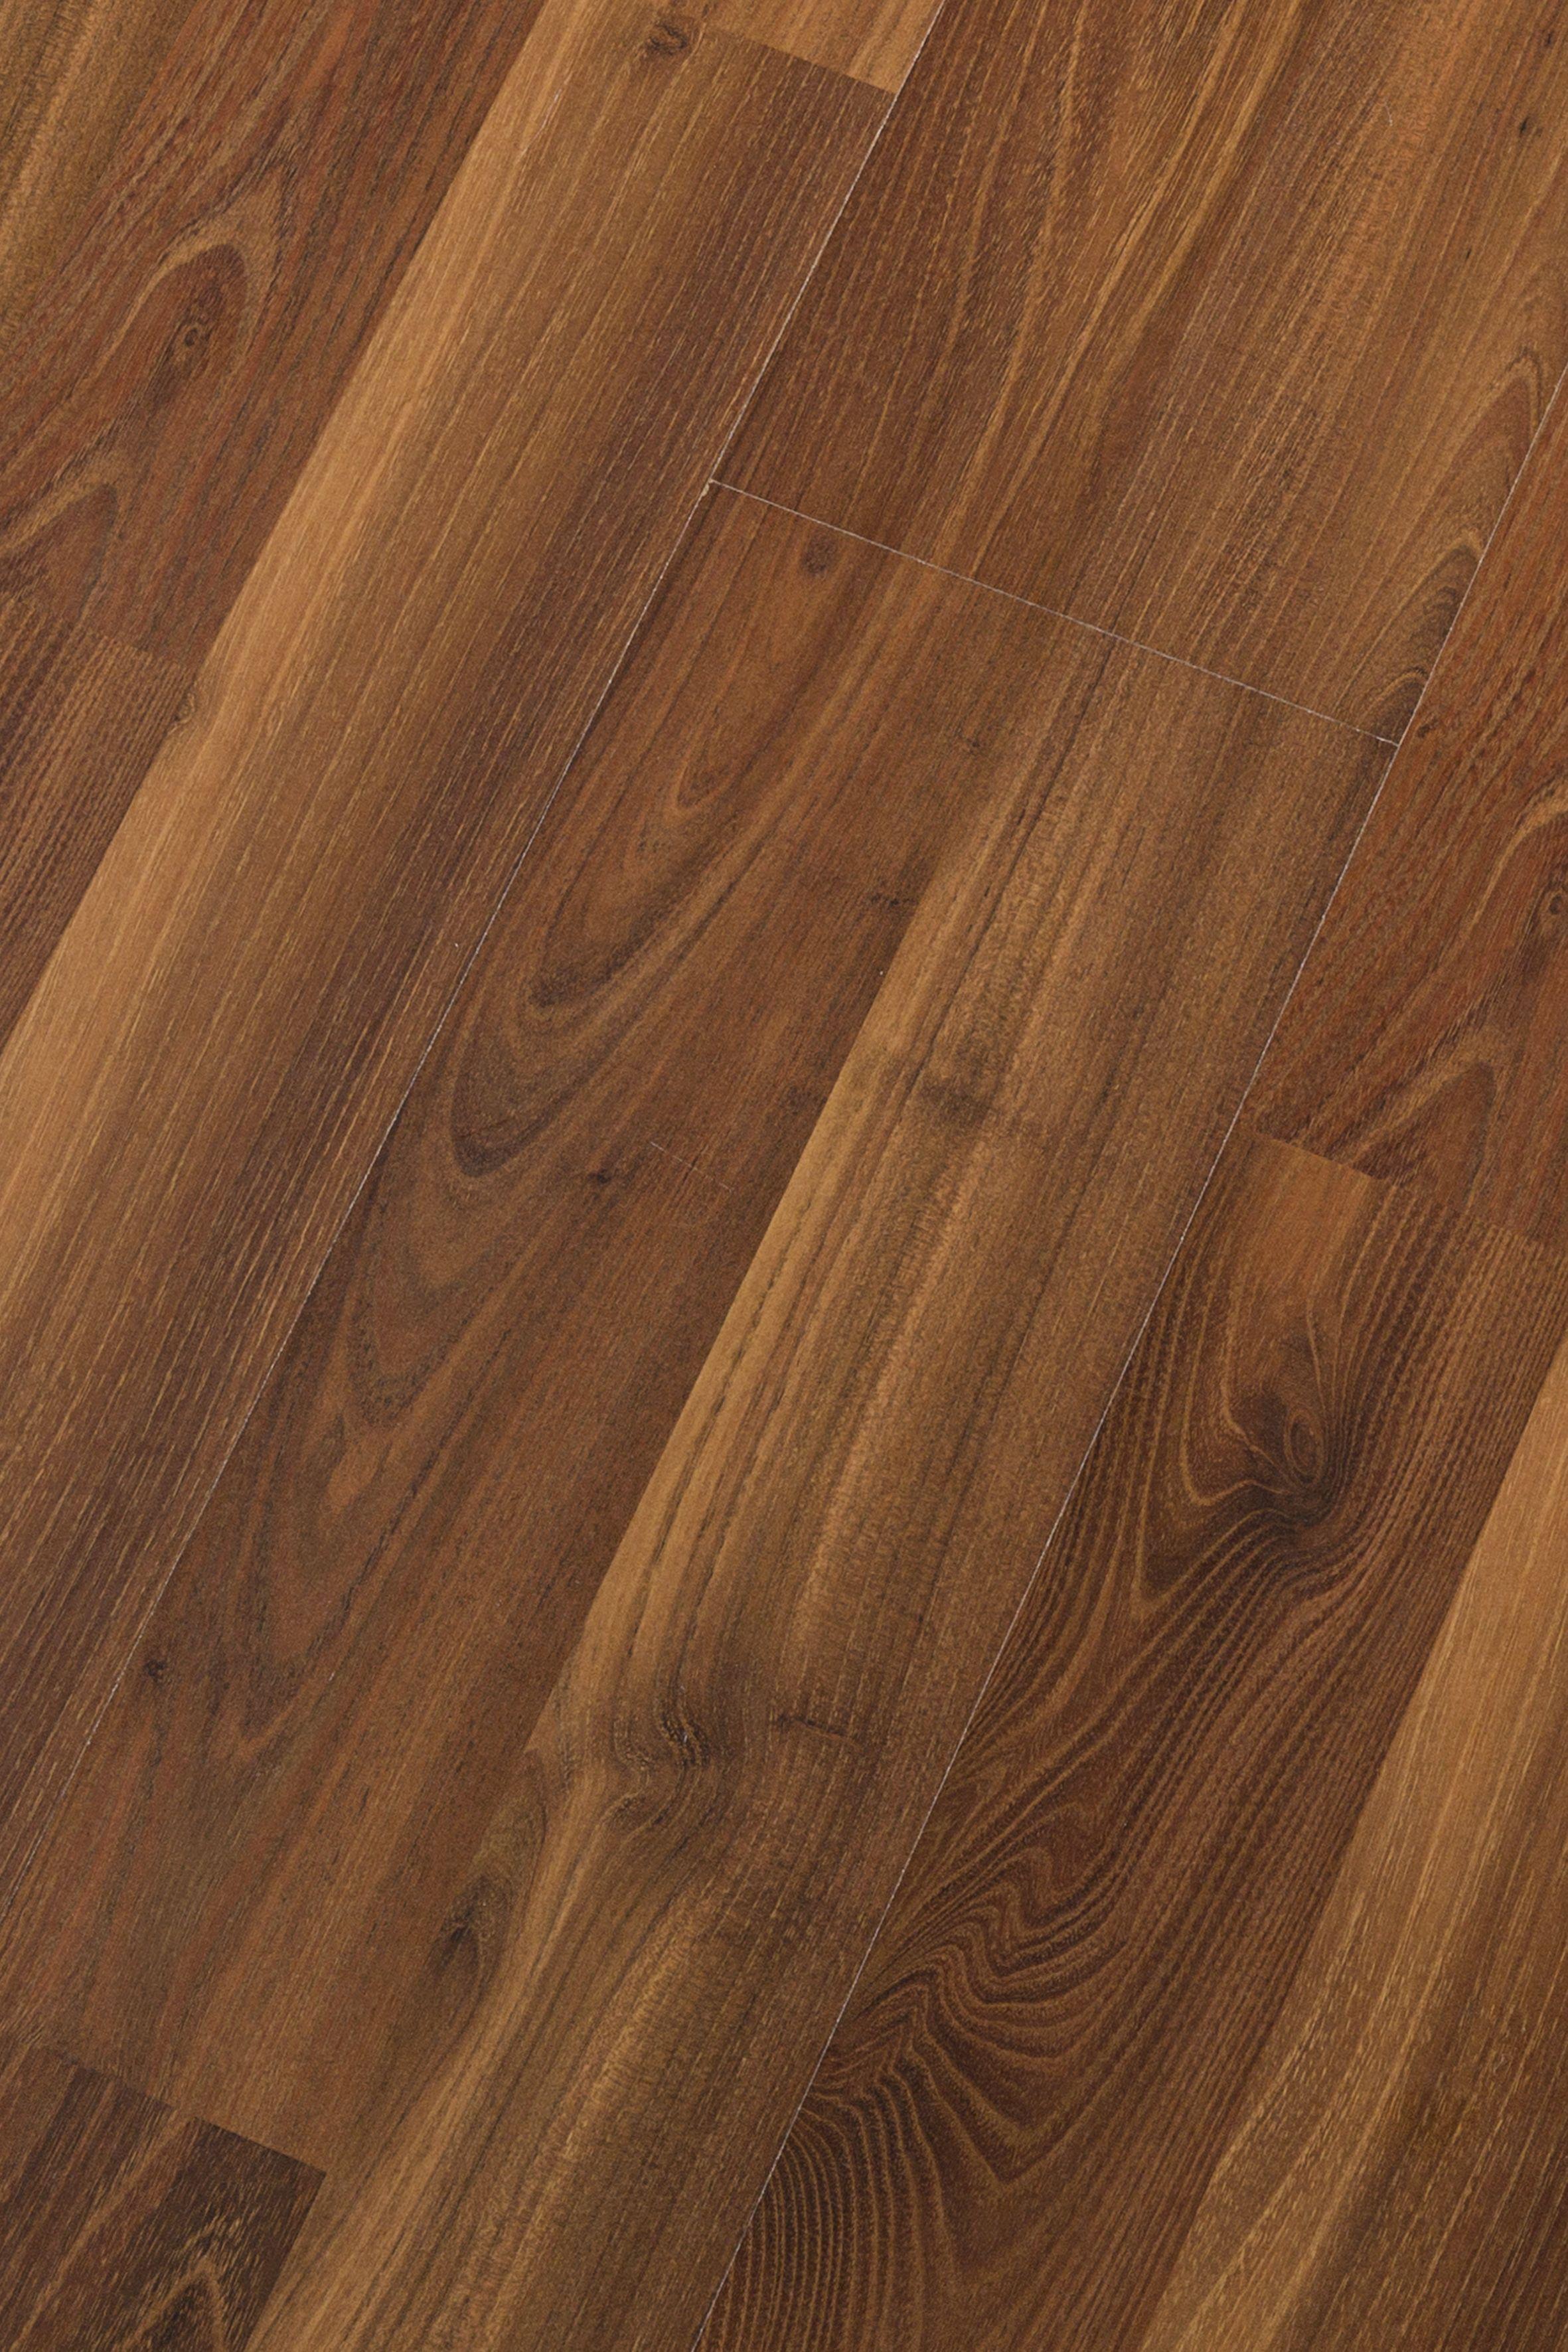 19 153 Laminat Akazie Laminat Holzarten Holz